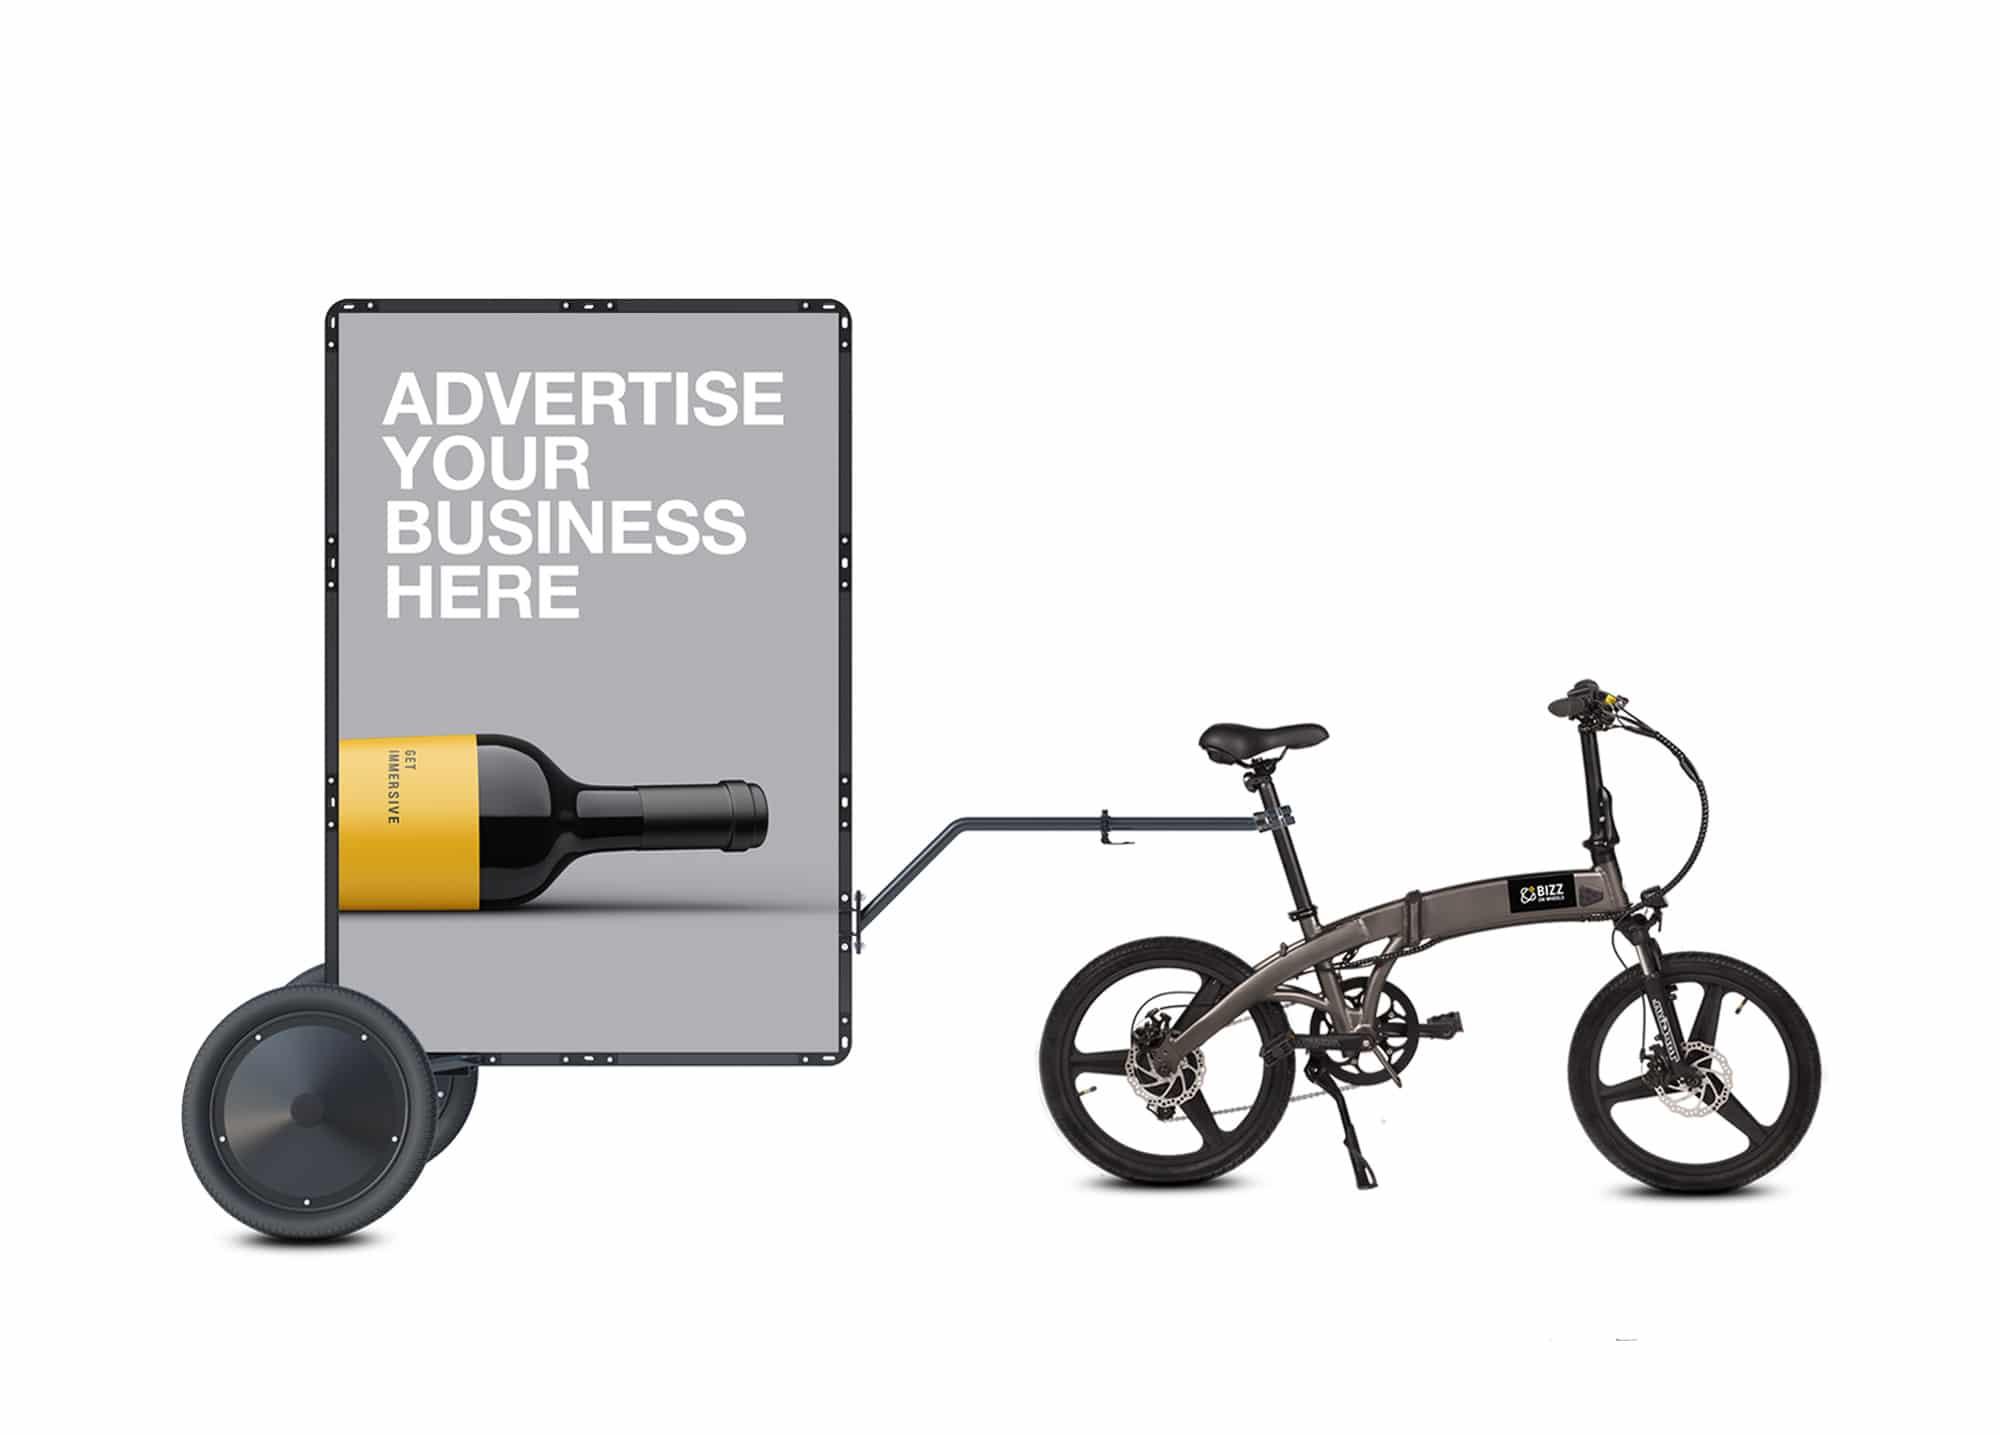 New AdBicy M mobile billboard